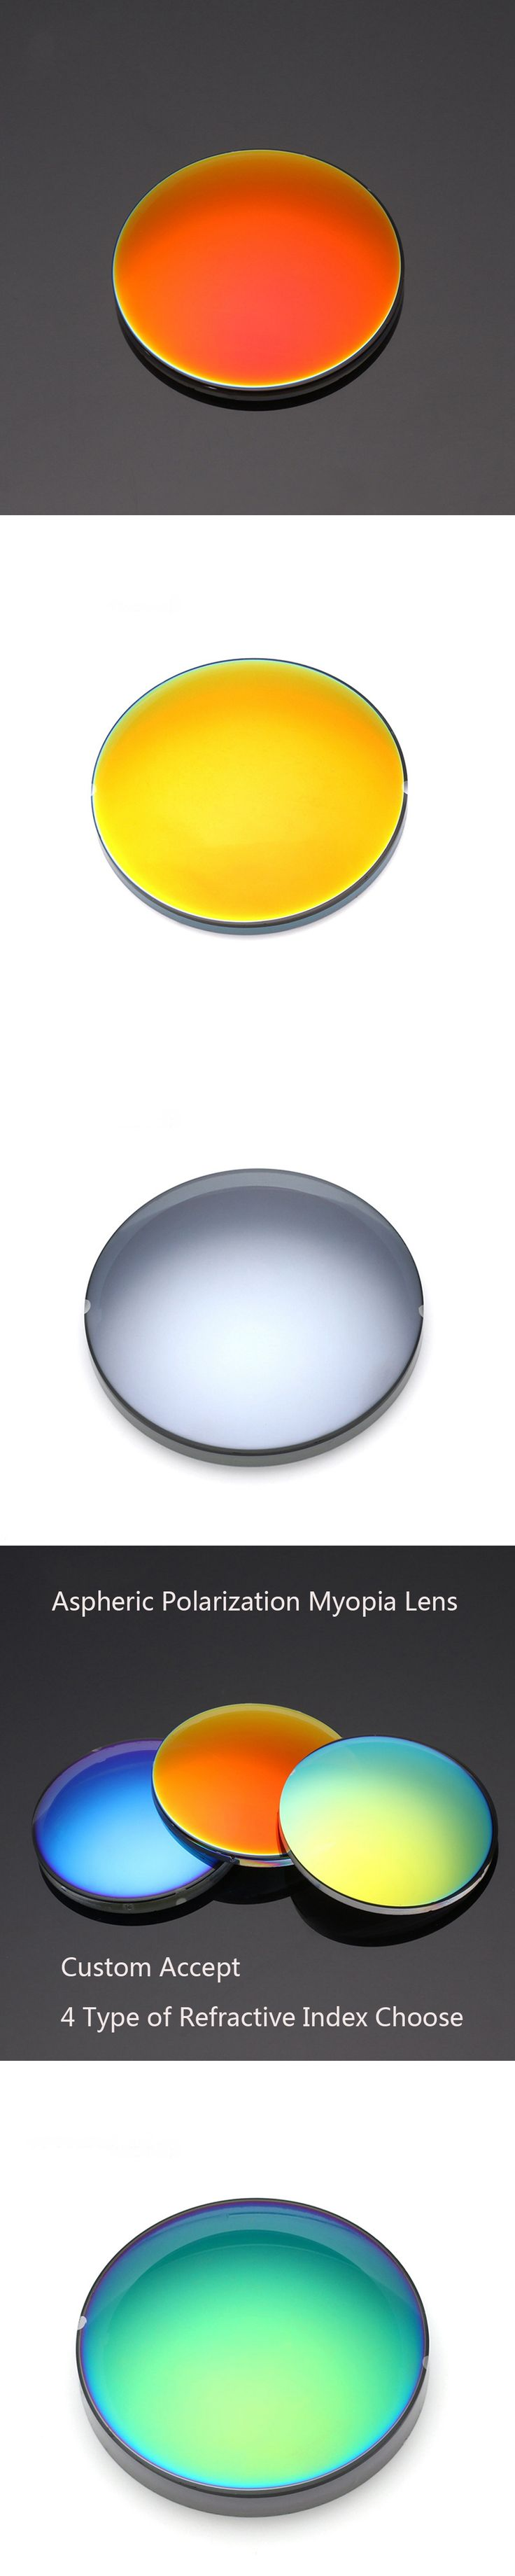 (Astigmat) Prescription Sunglasses Customize Online Accept Aspherical Polarization Myopia Lenses With above Sph-5.0 index 1.67